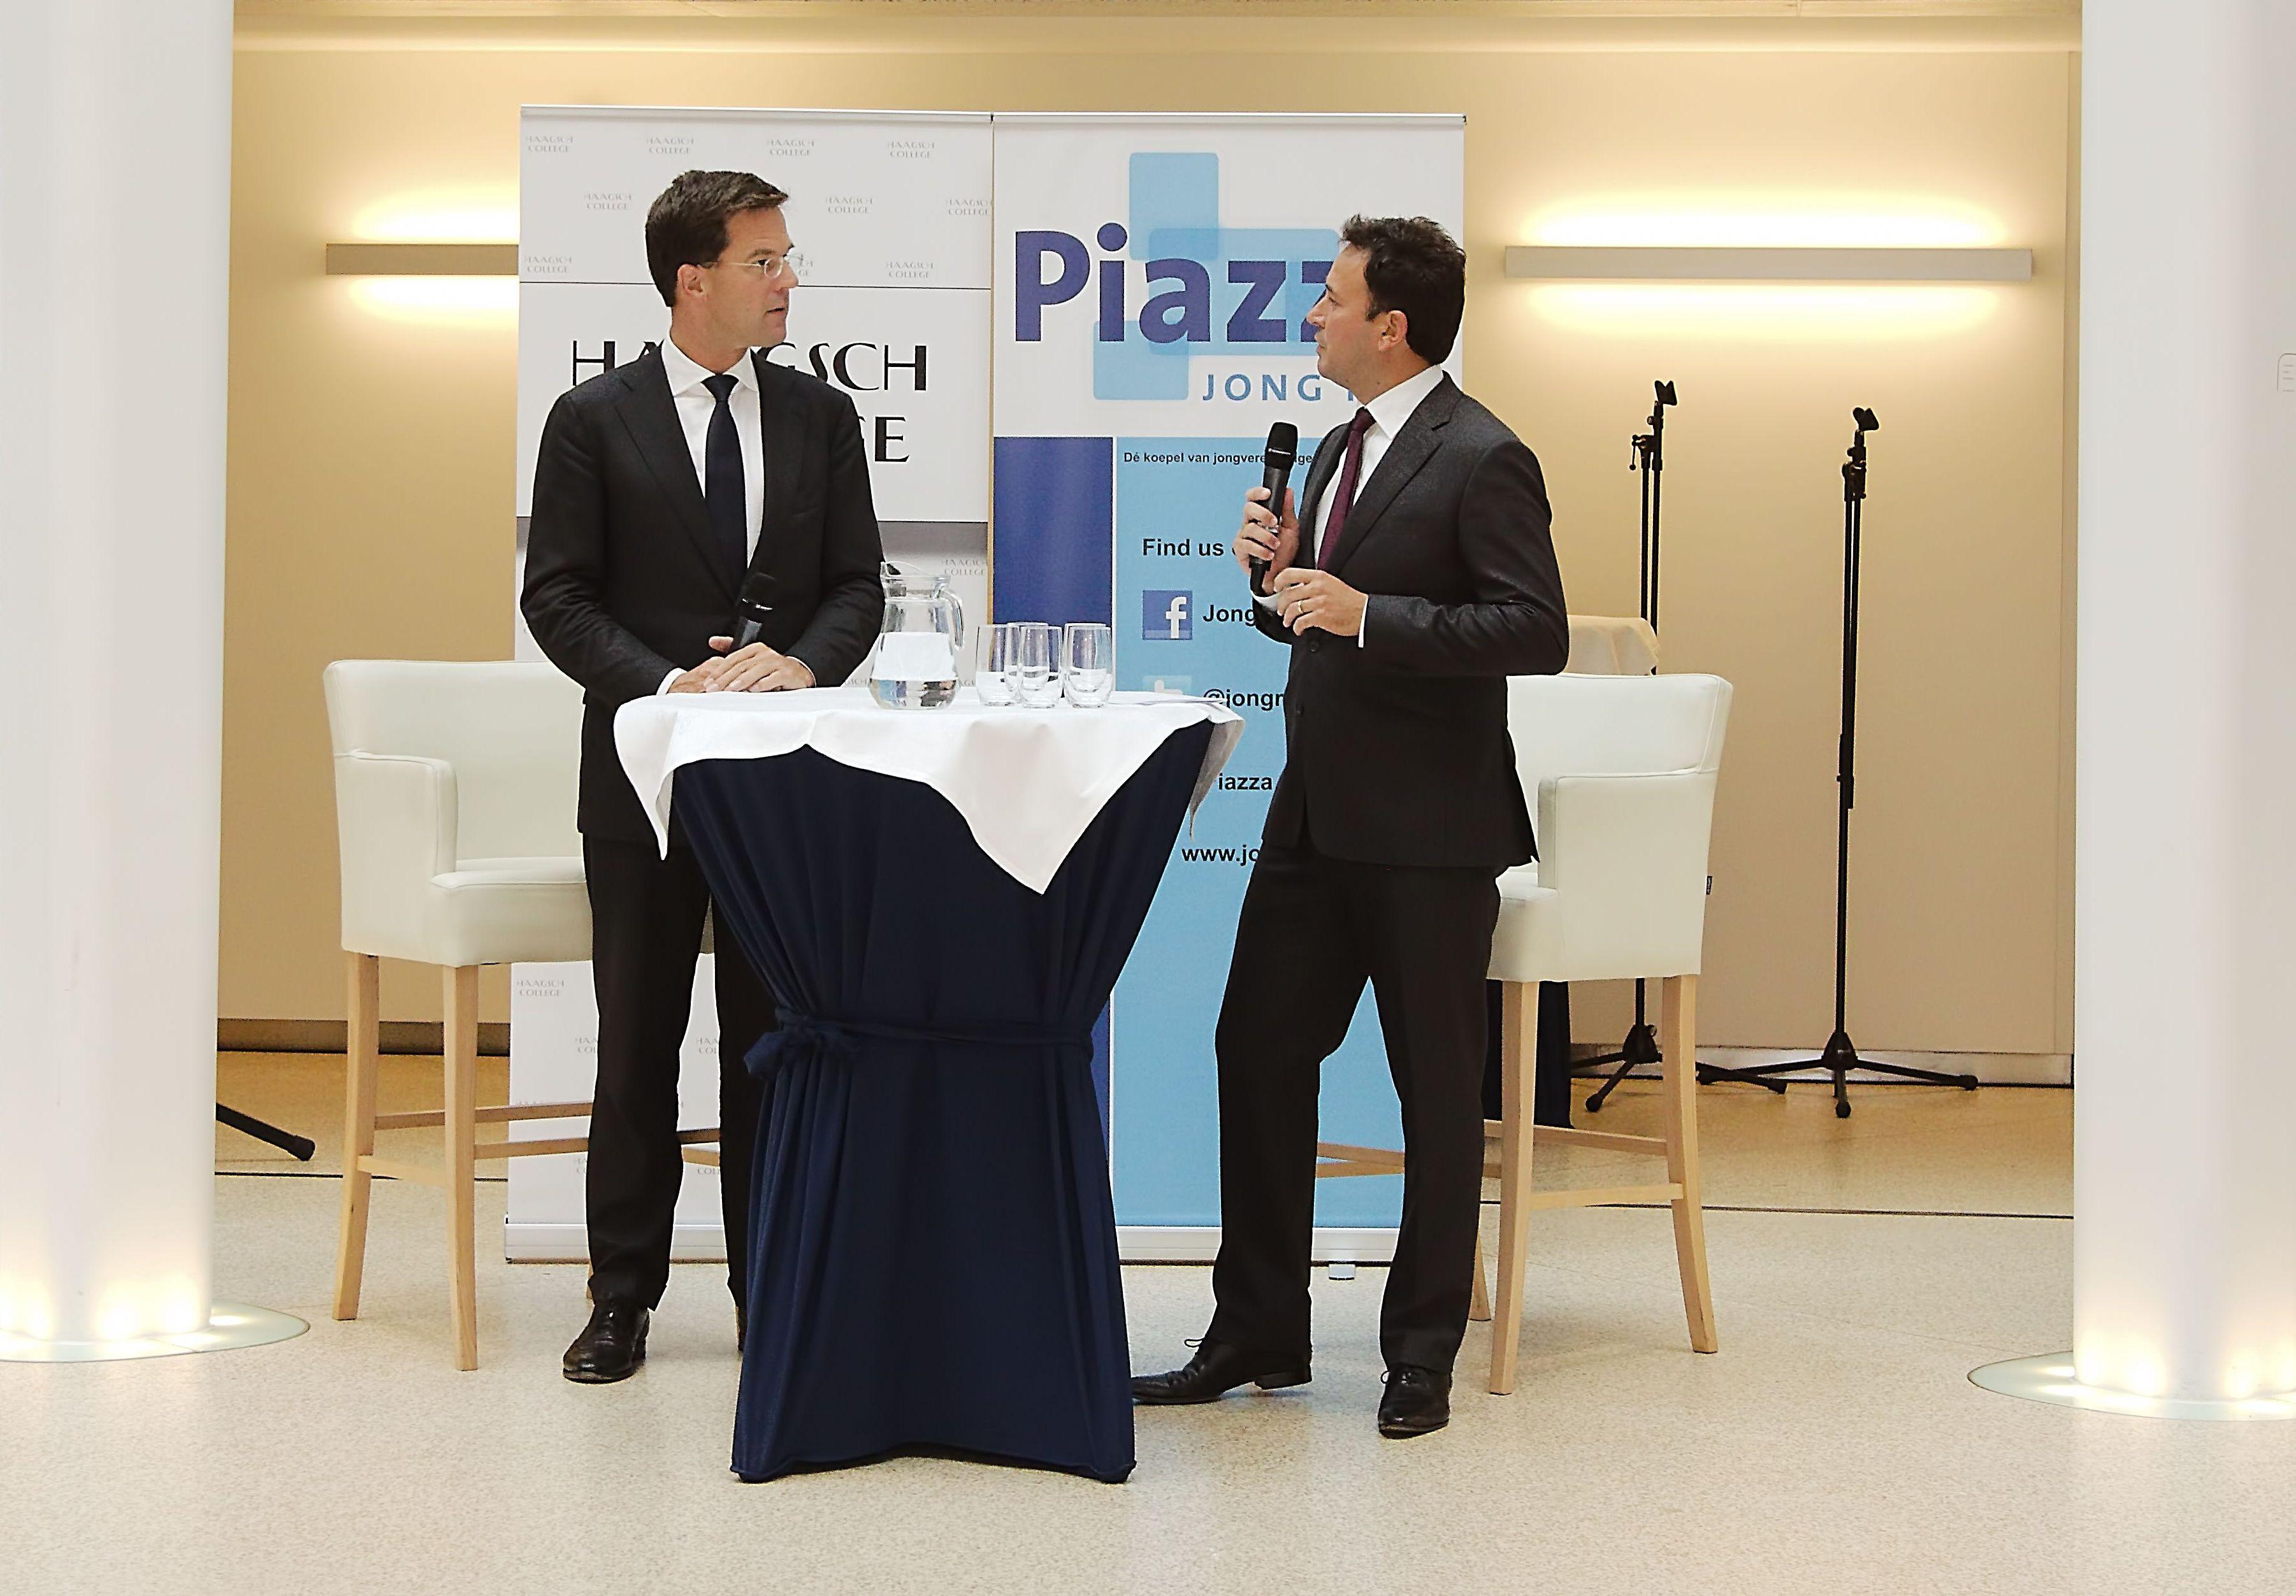 Piazza_26